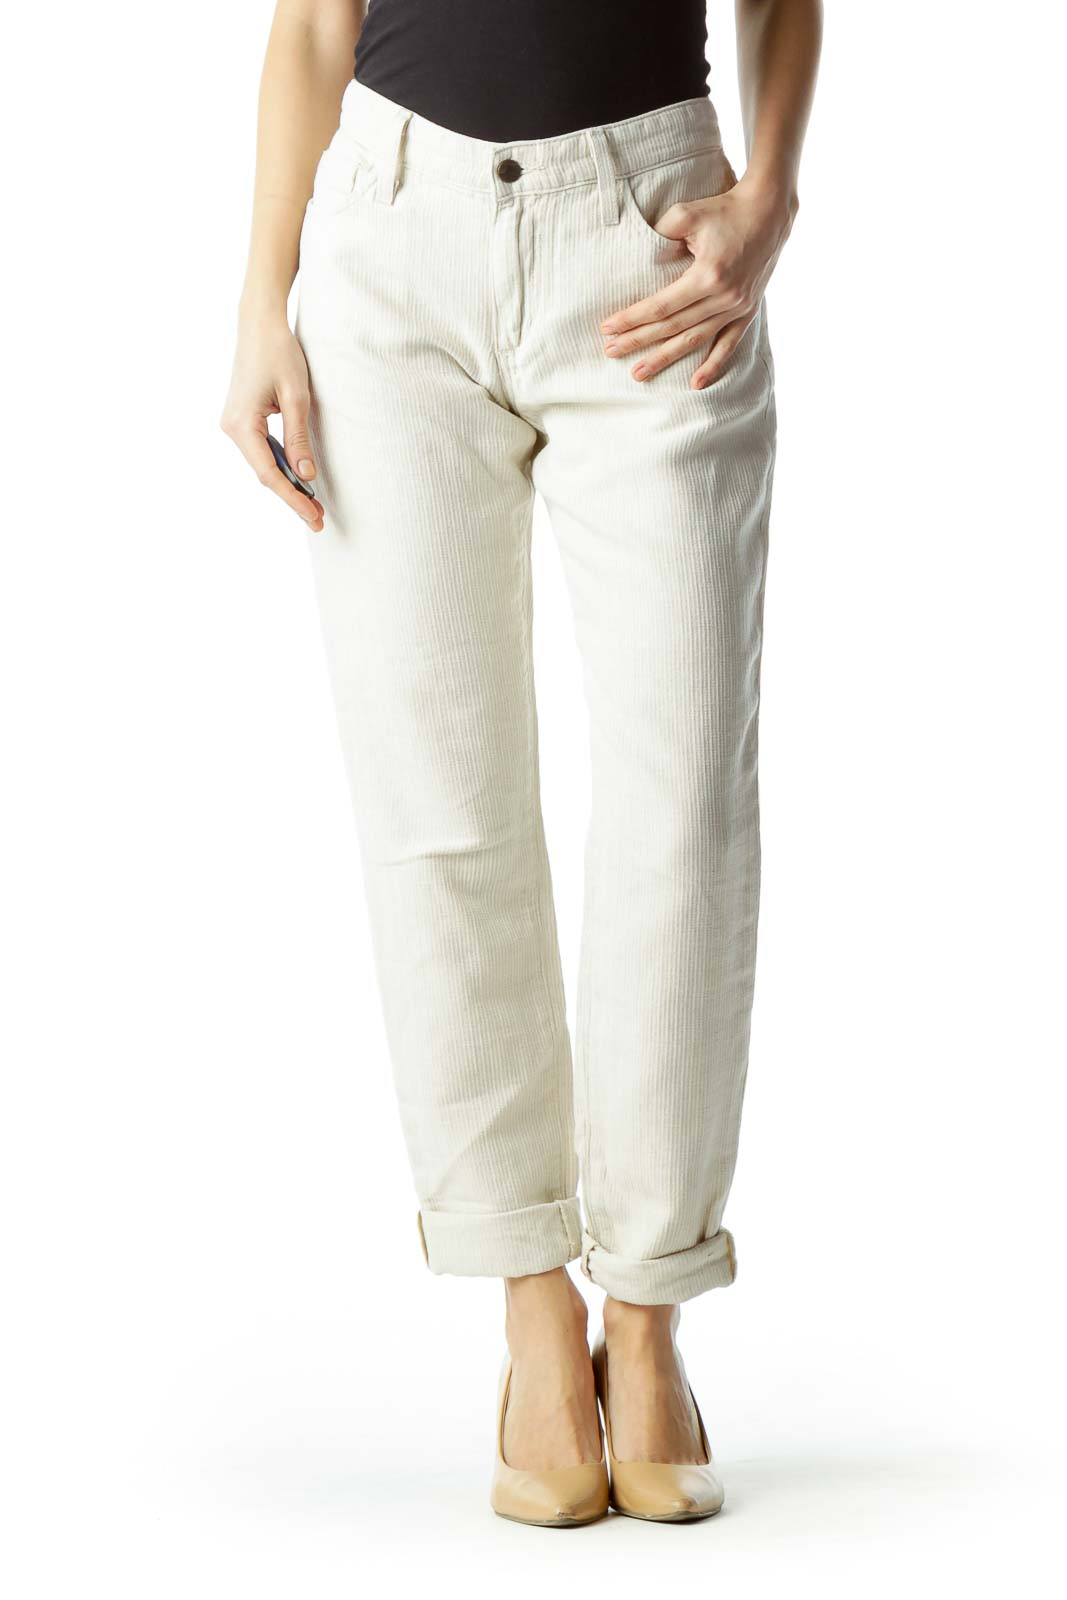 Beige Textured Cotton and Linen Pants